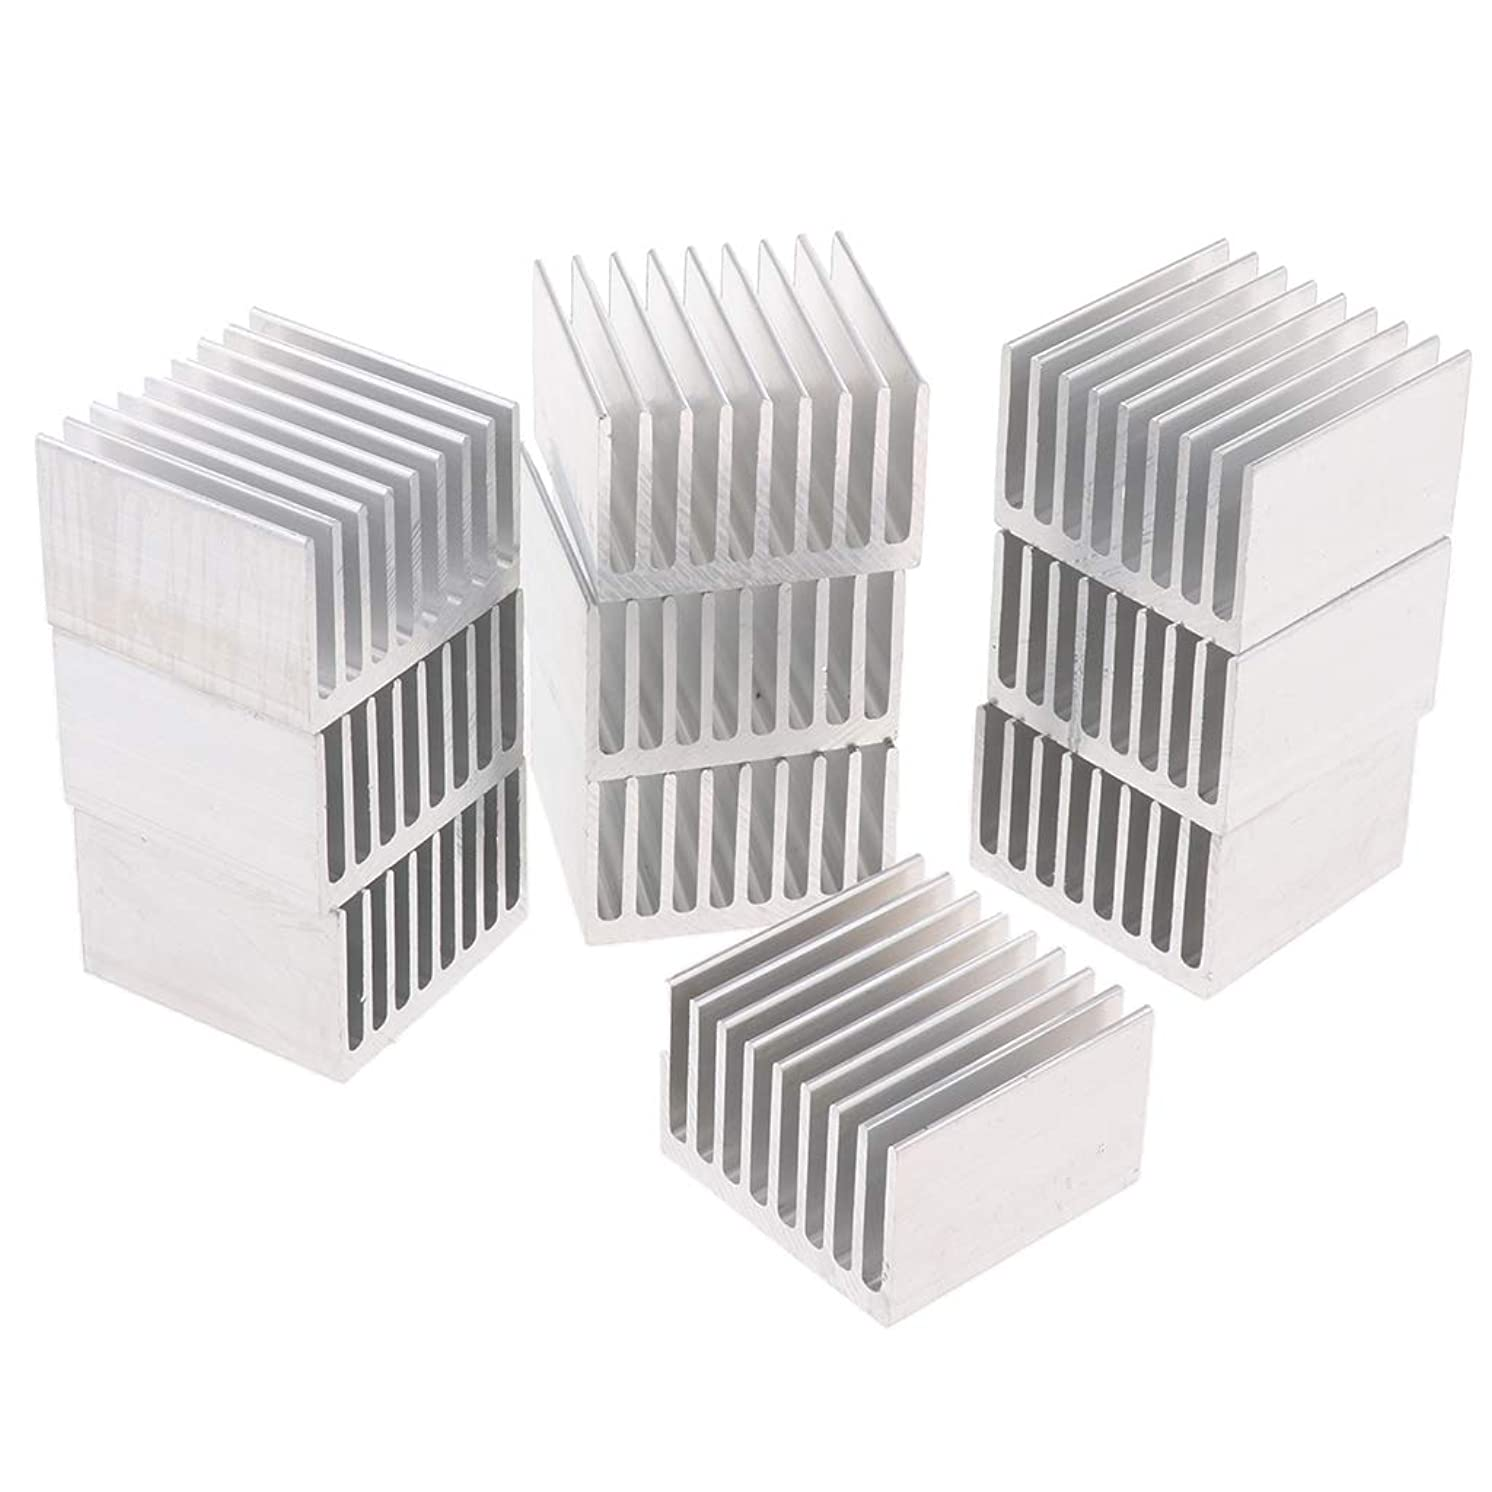 Almencla 10pcs Silver Aluminum Heat Sink Heatsink Module Cooler Fin for Led Amplifier Transistor Semiconductor Devices